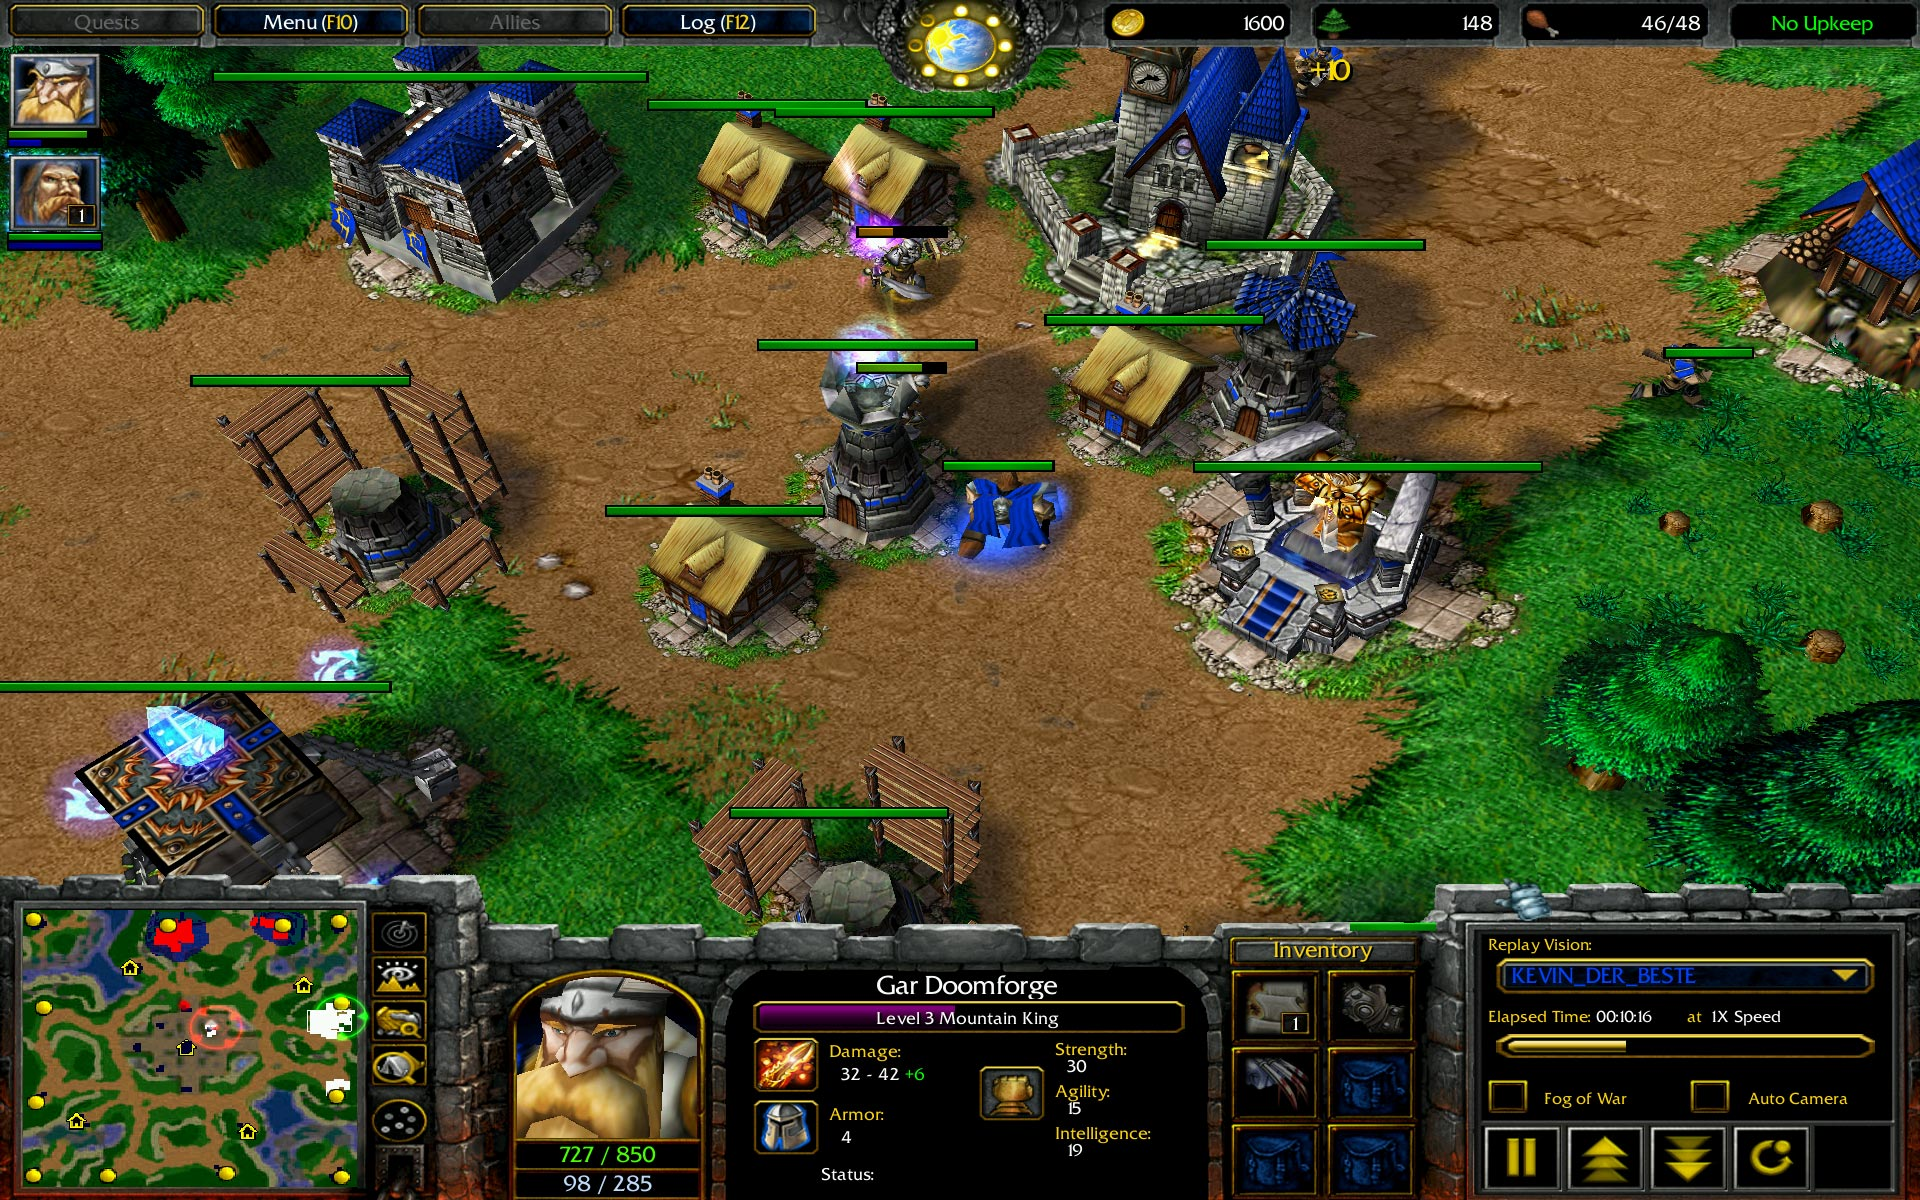 Warcraft 3 Screenshots Warcraft 3 Tools